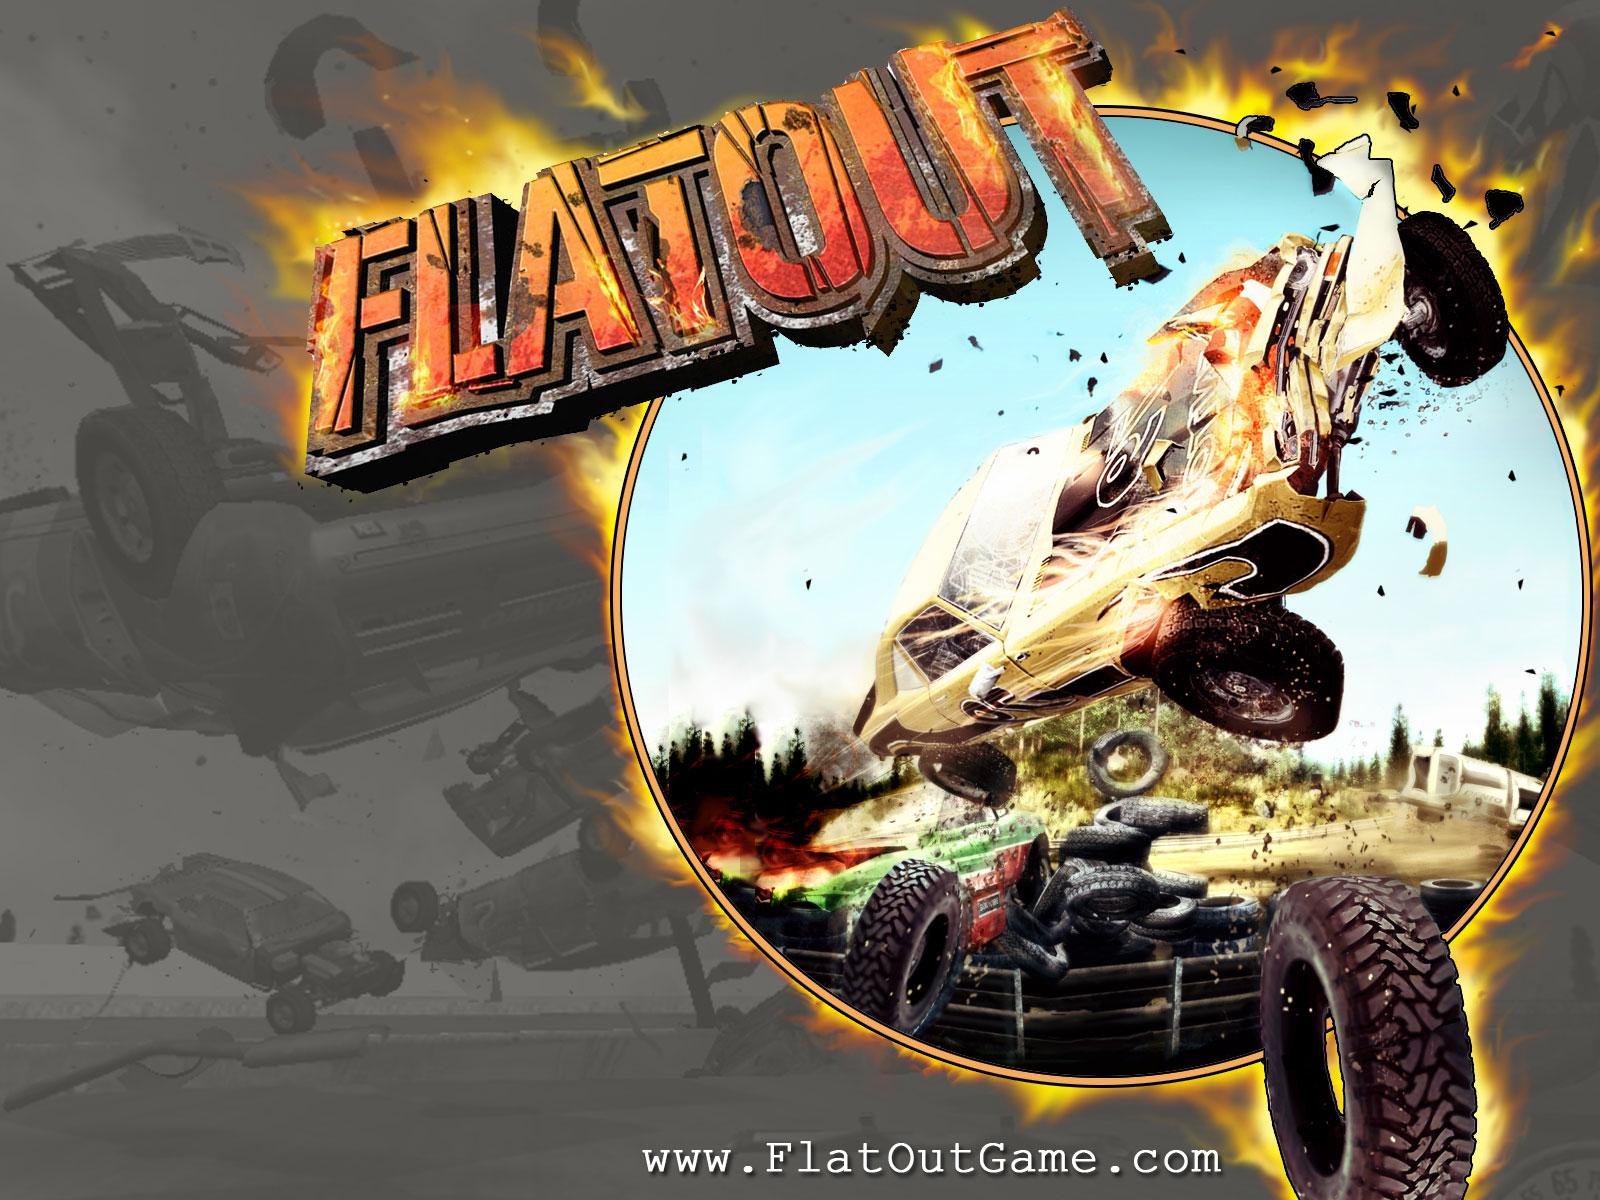 flatout2